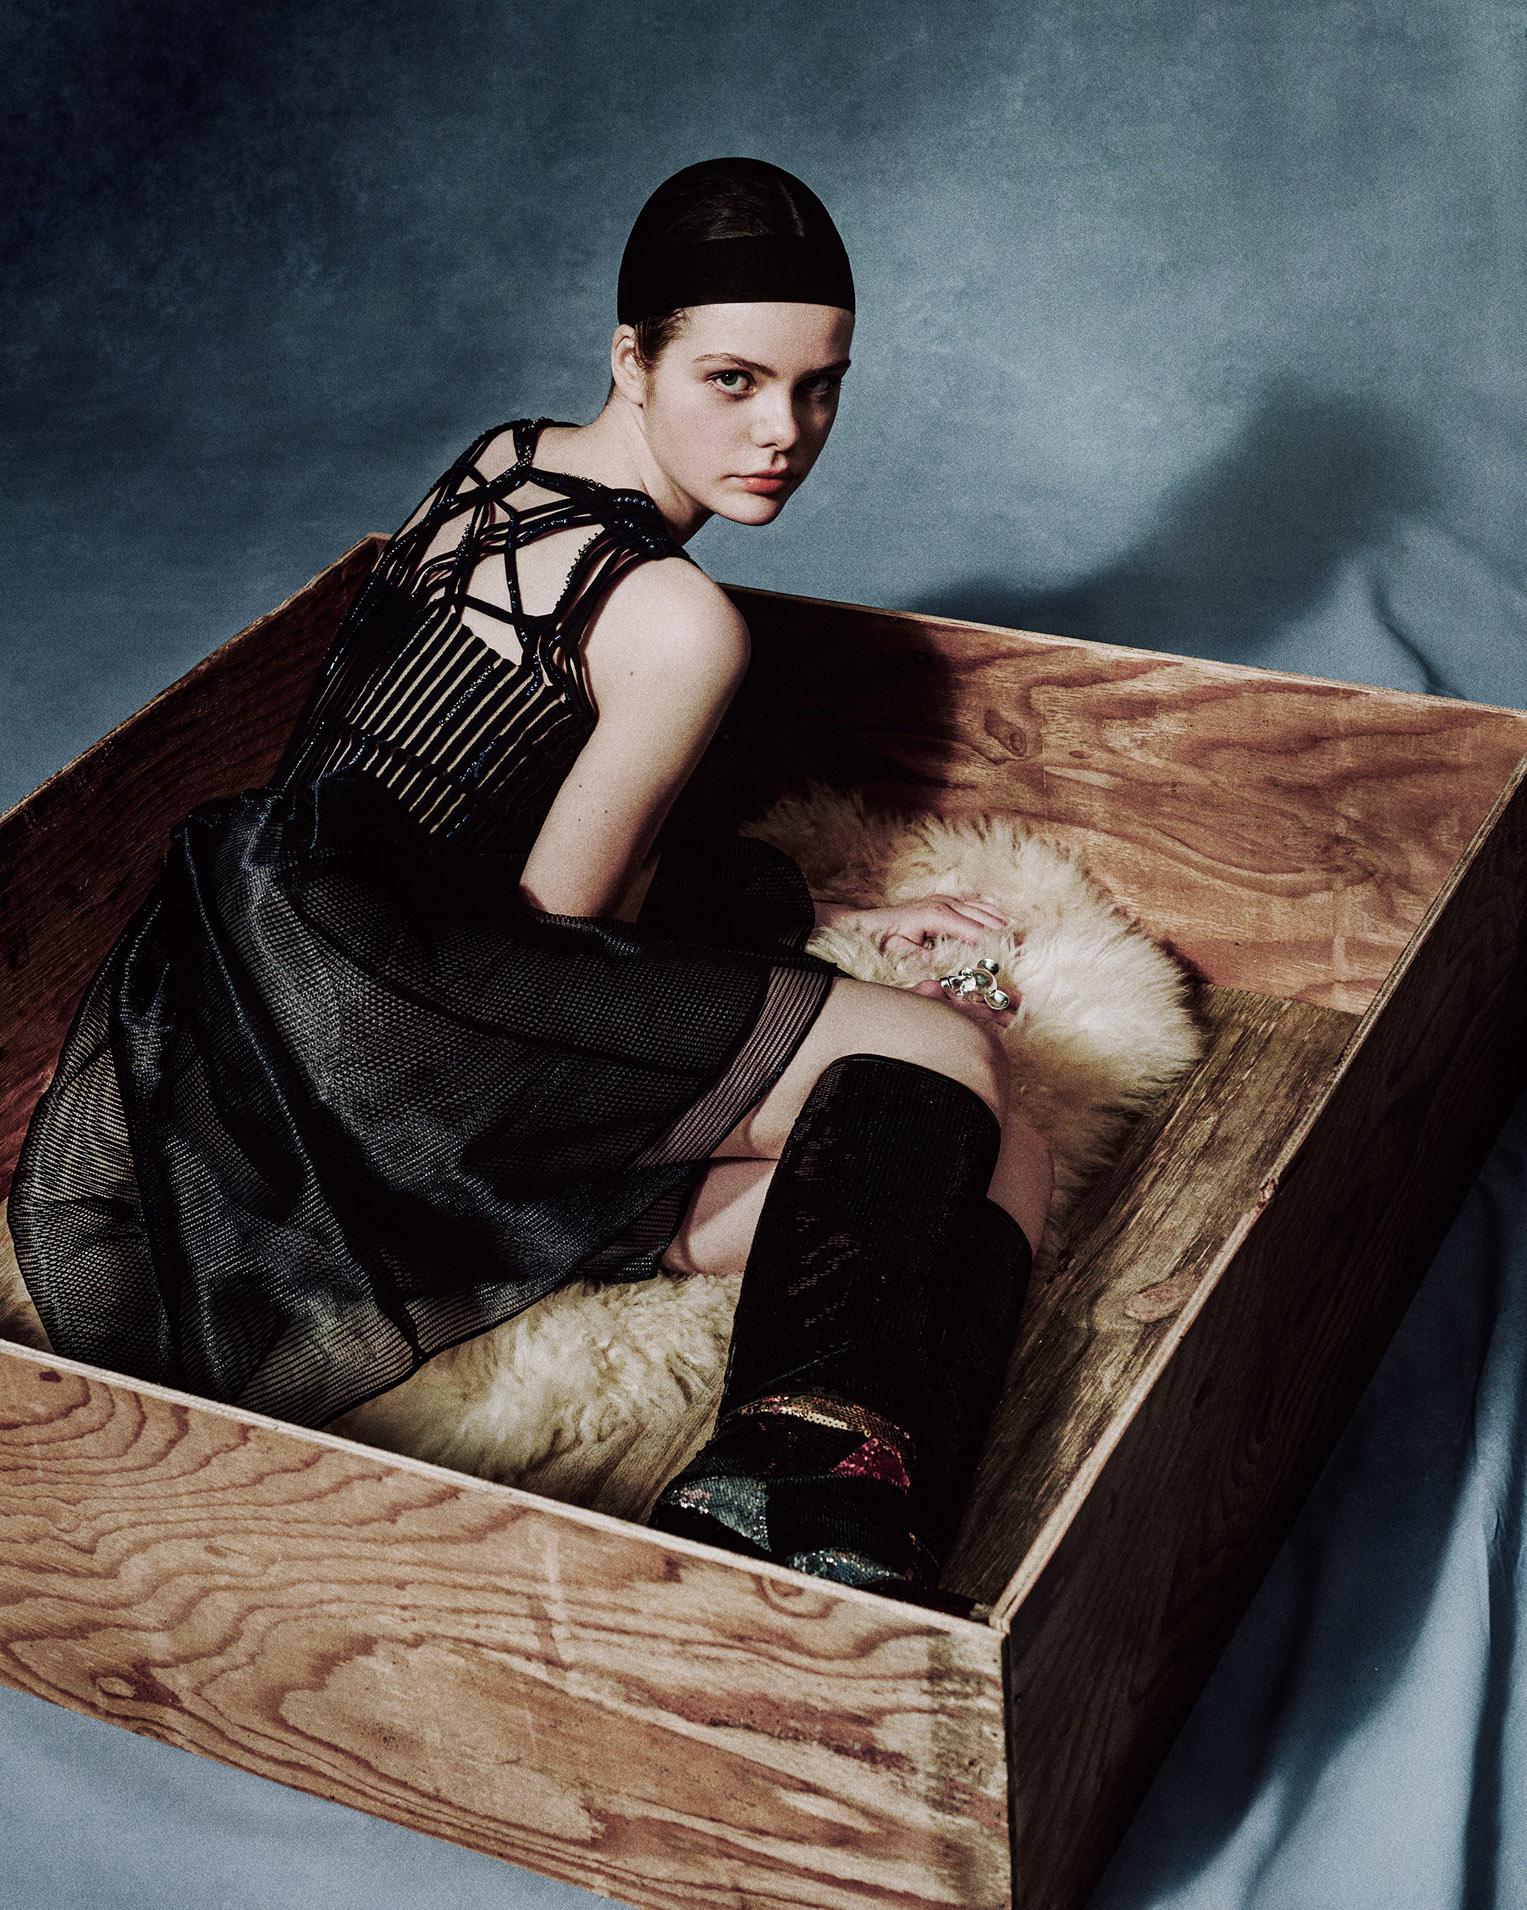 Julia Nicole by Elizaveta Porodina / Cocoon magazine 2016